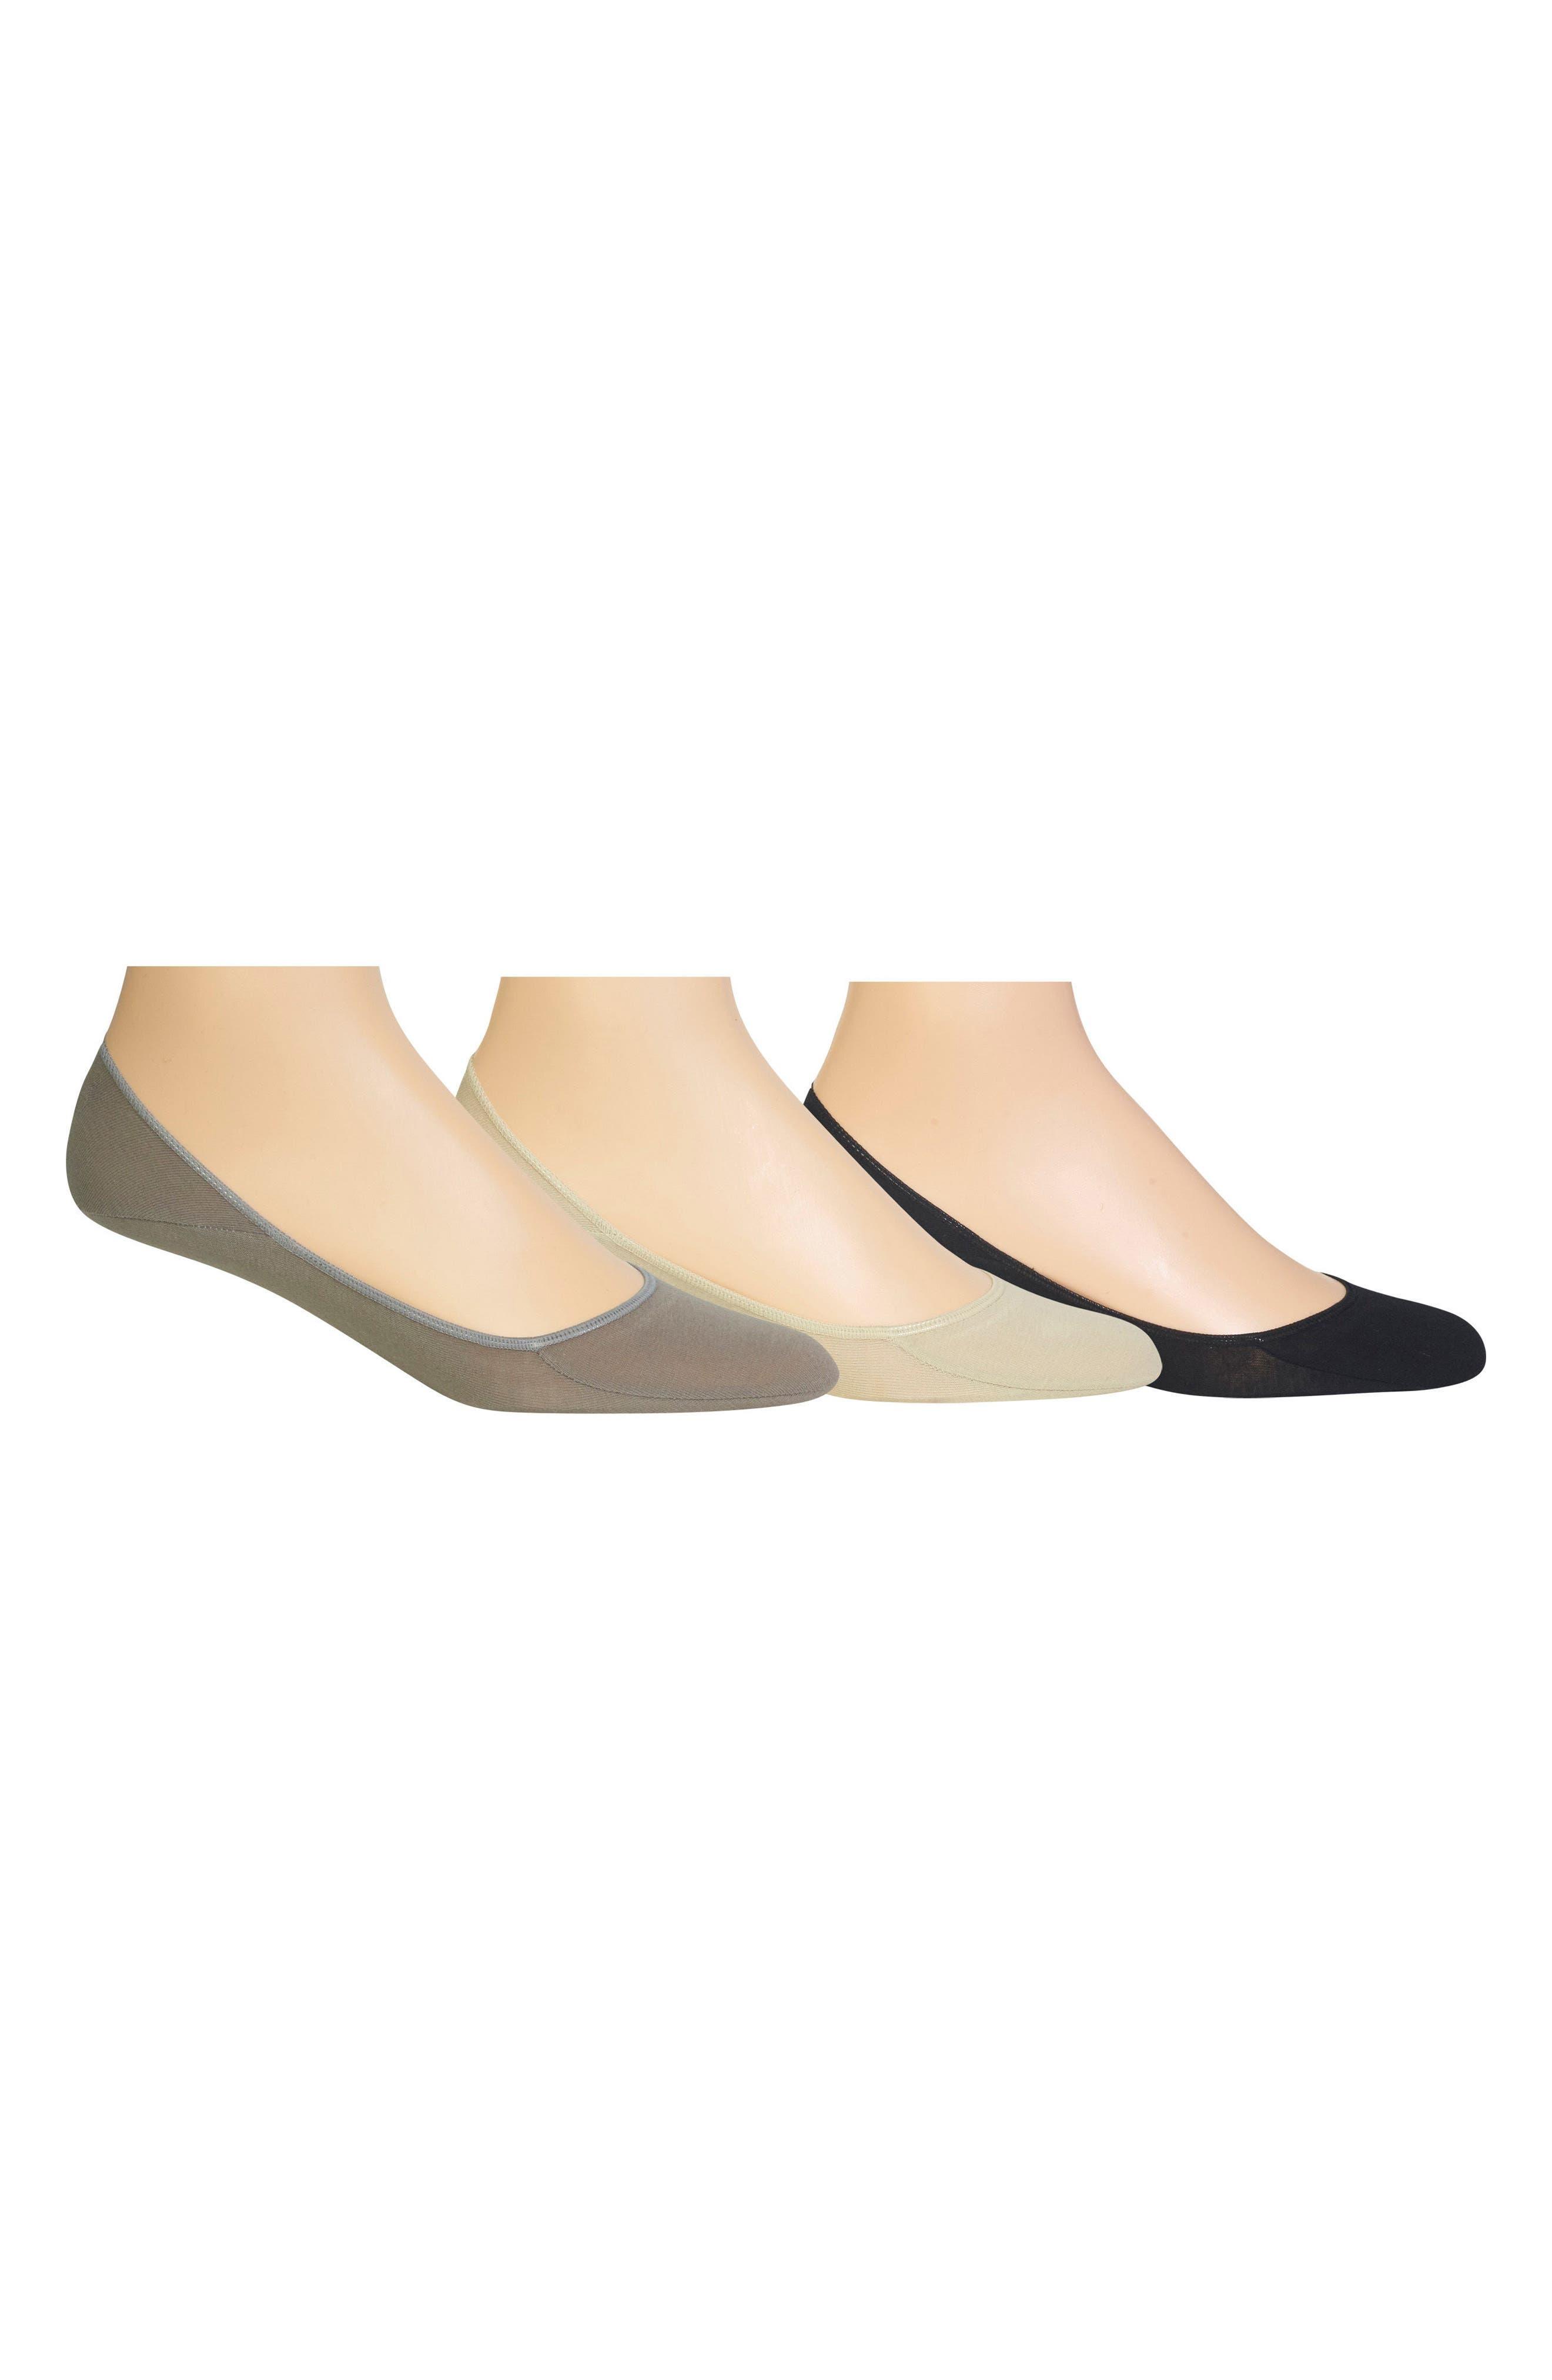 3-Pack Liner Socks,                             Main thumbnail 1, color,                             Grey/ Oyster/ Black